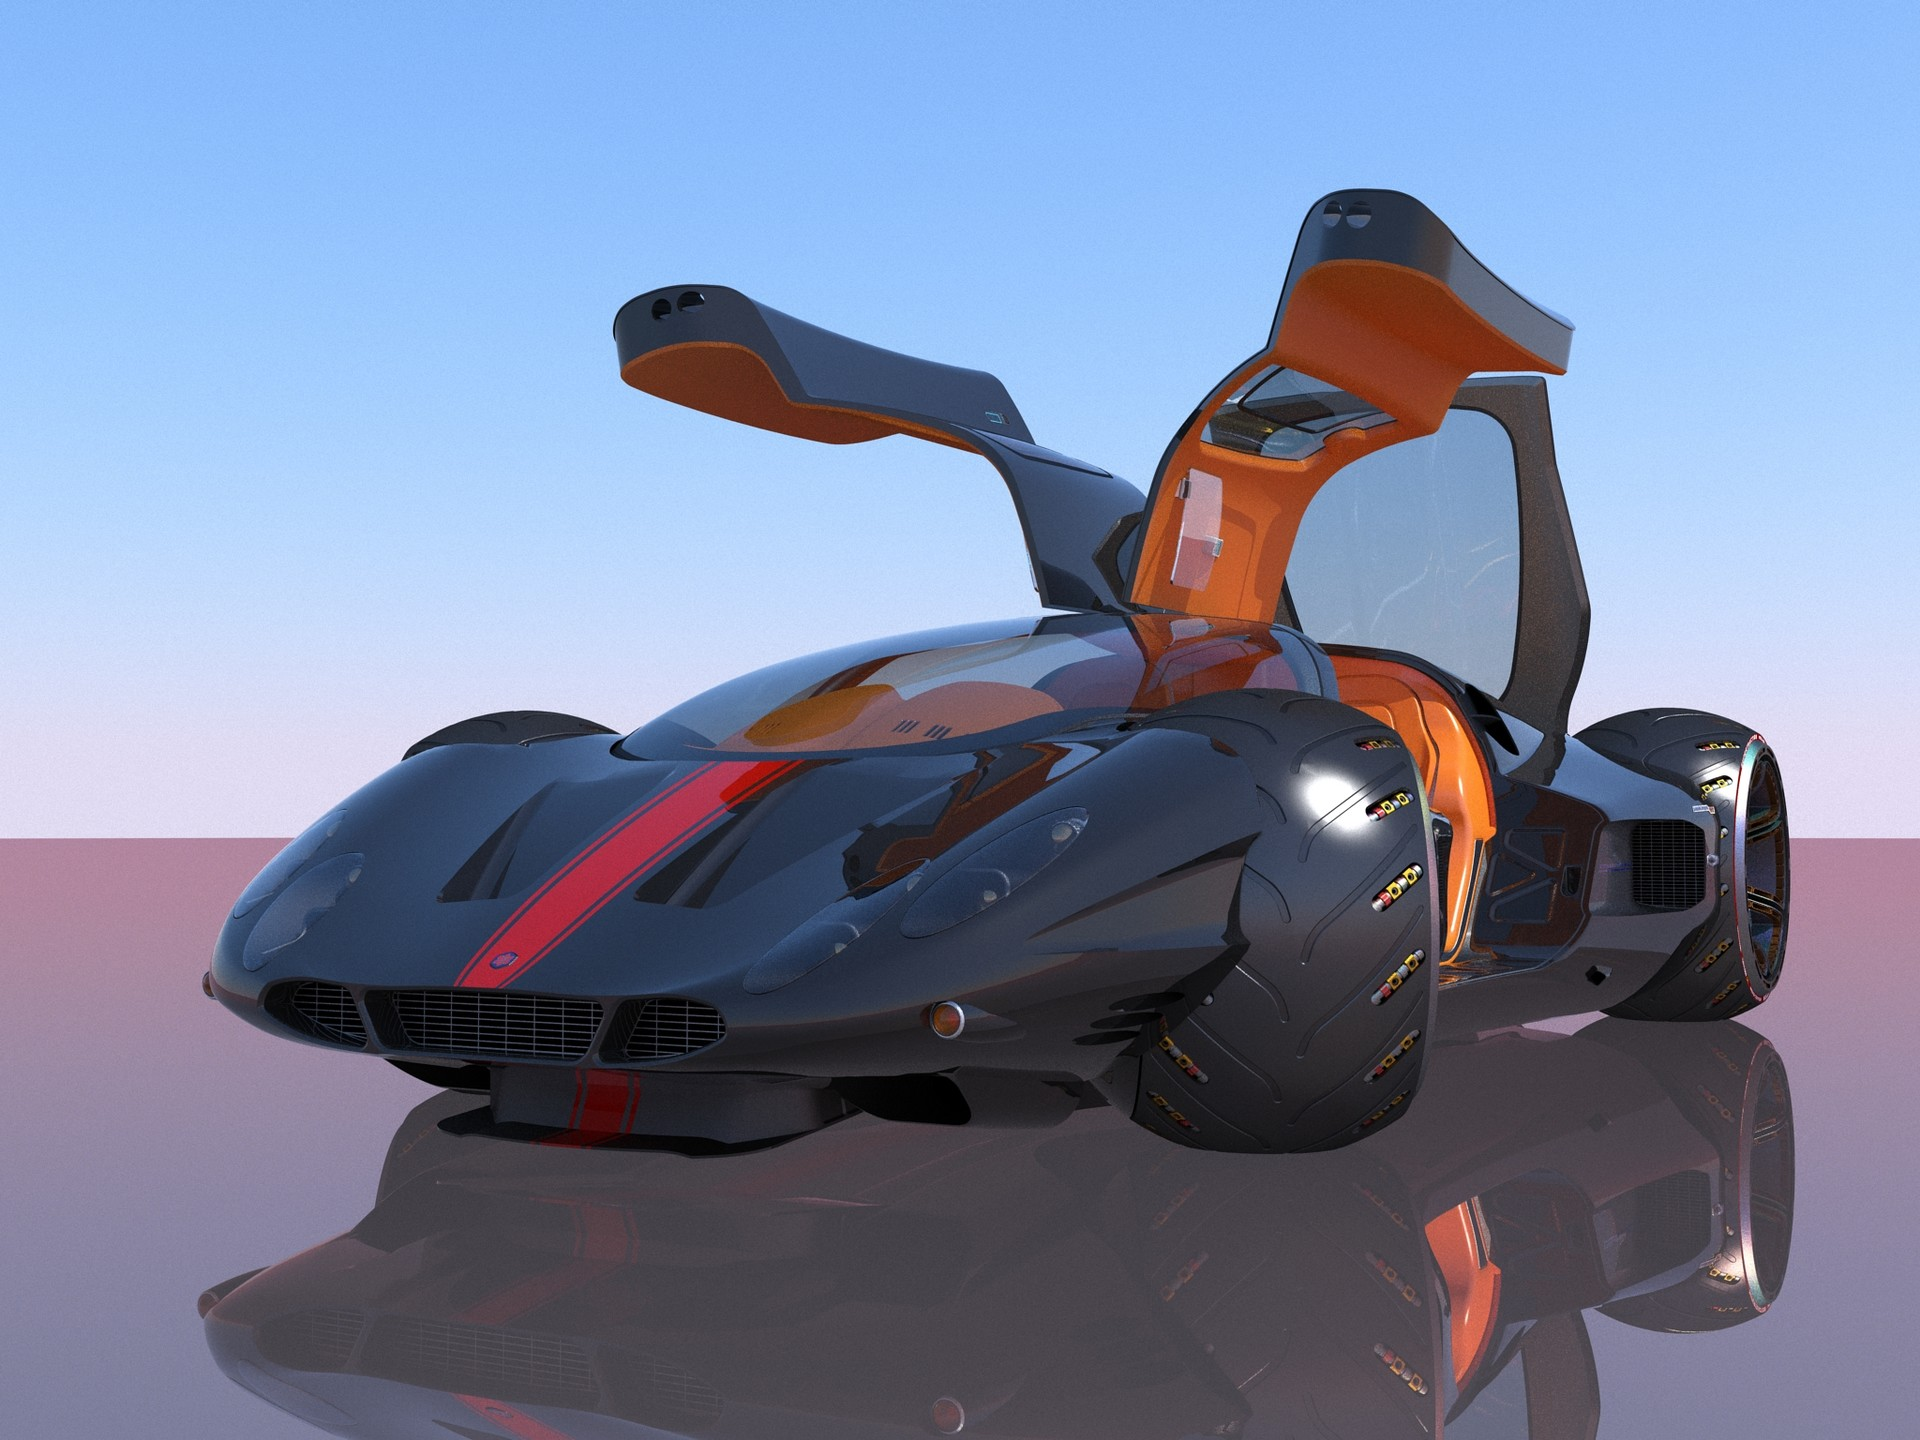 Joachim sverd supercar concept48doors open